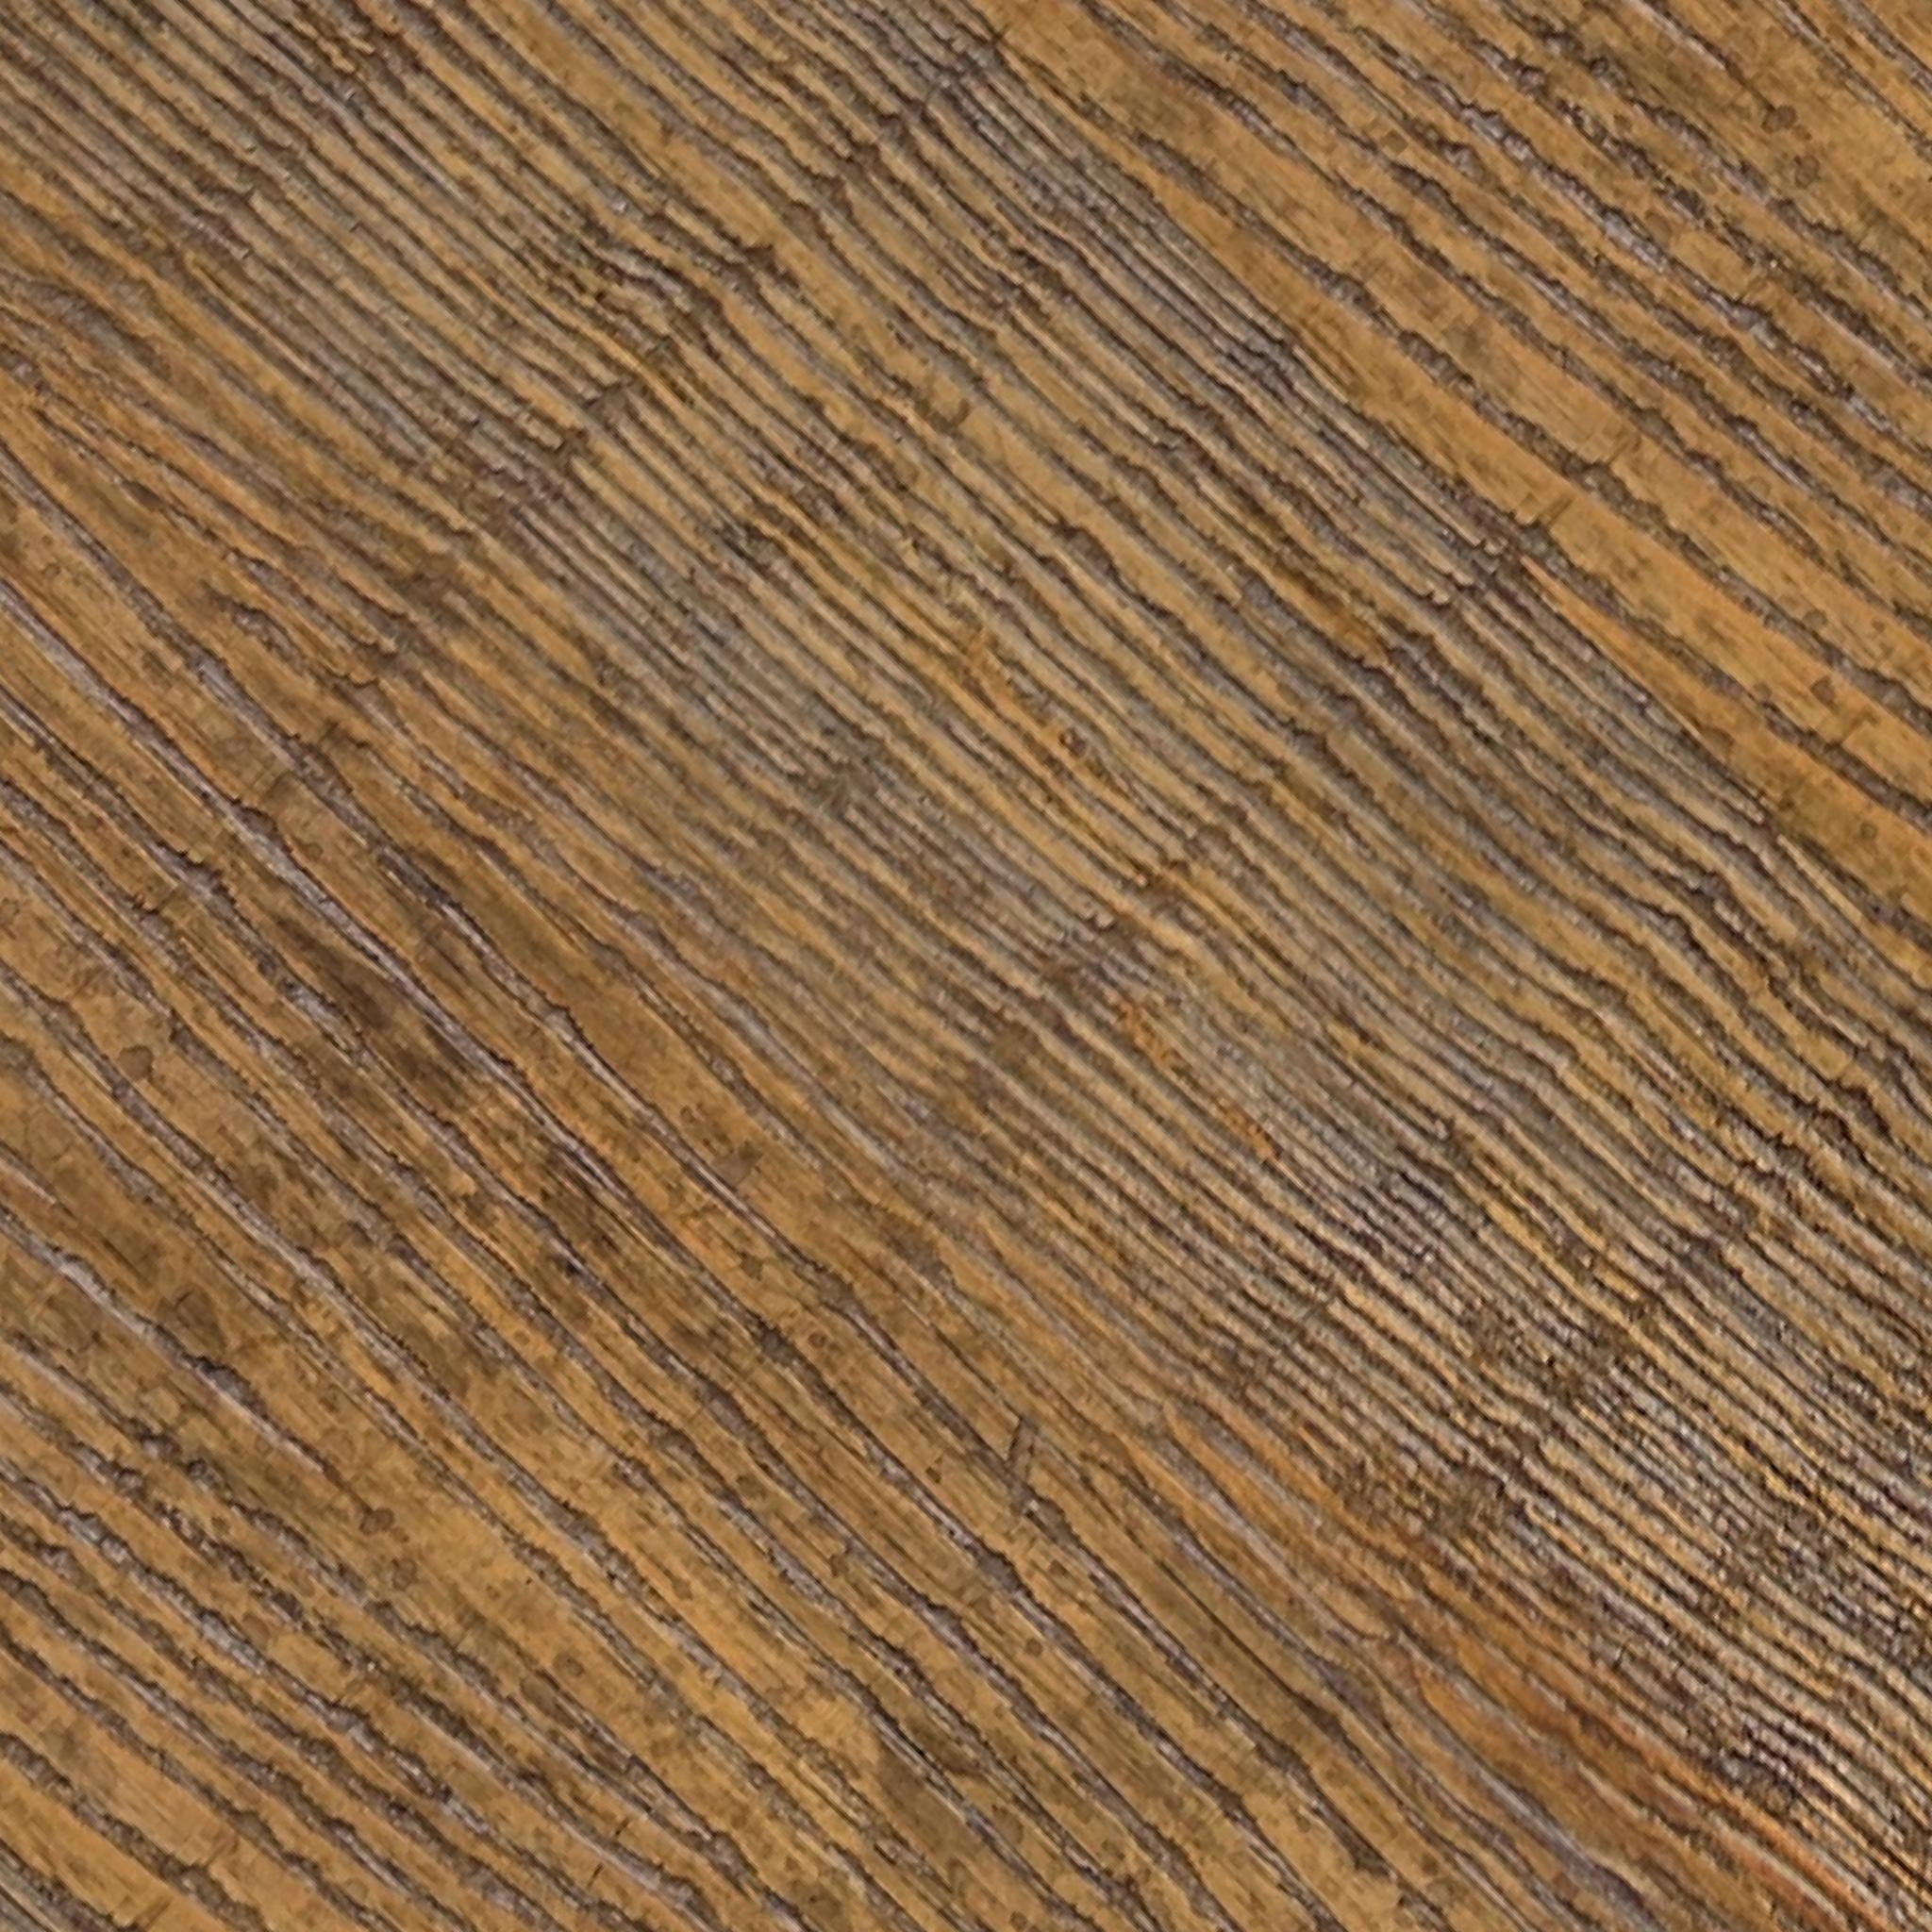 Rough Hewn Pine Rendernode Pine Wood Texture Rough Hewn Pine Wood